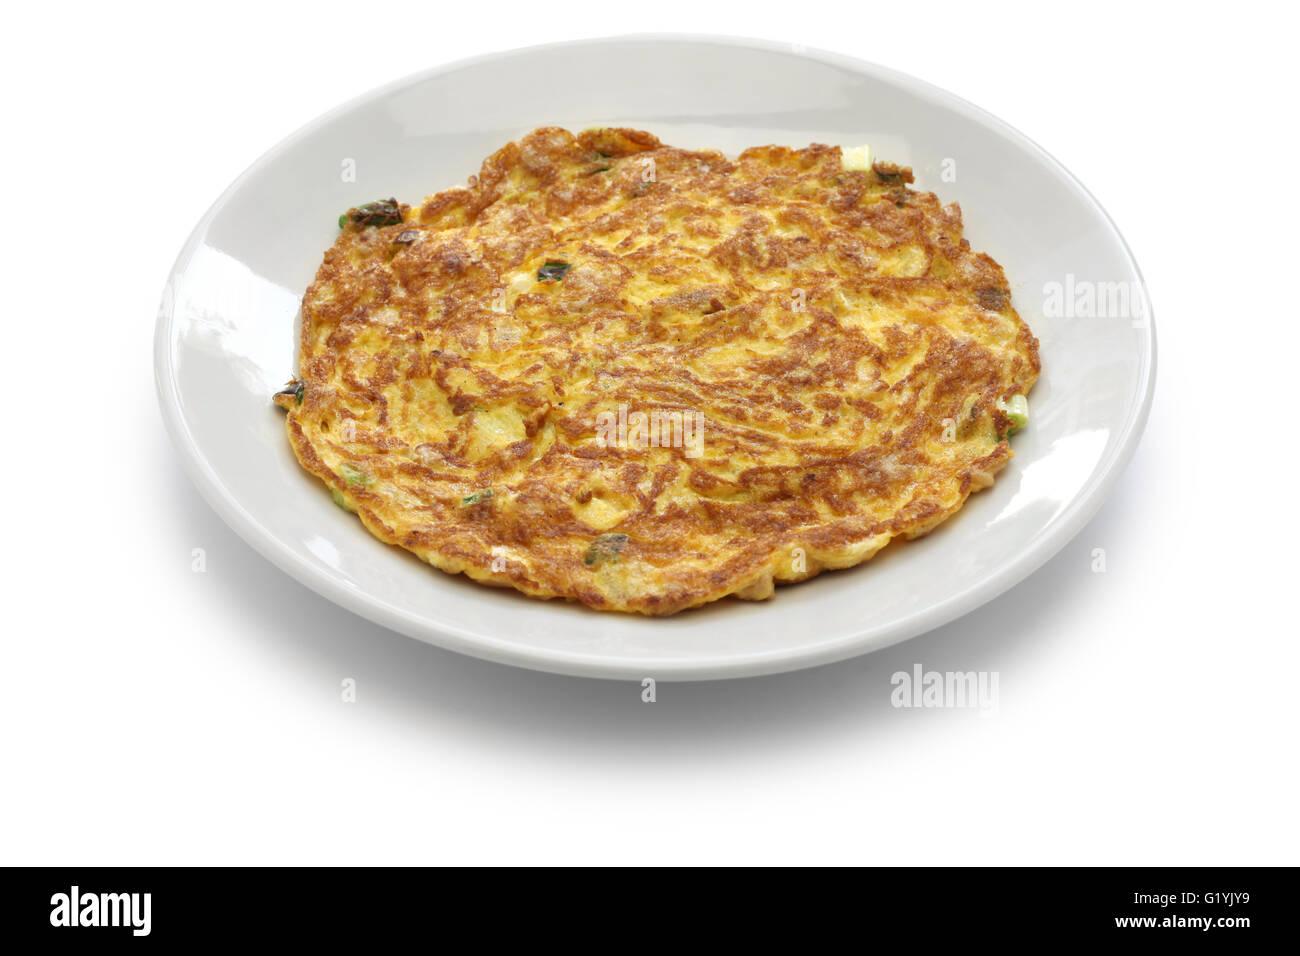 Taiwanese dried radish omelet, Taiwanese cuisine - Stock Image